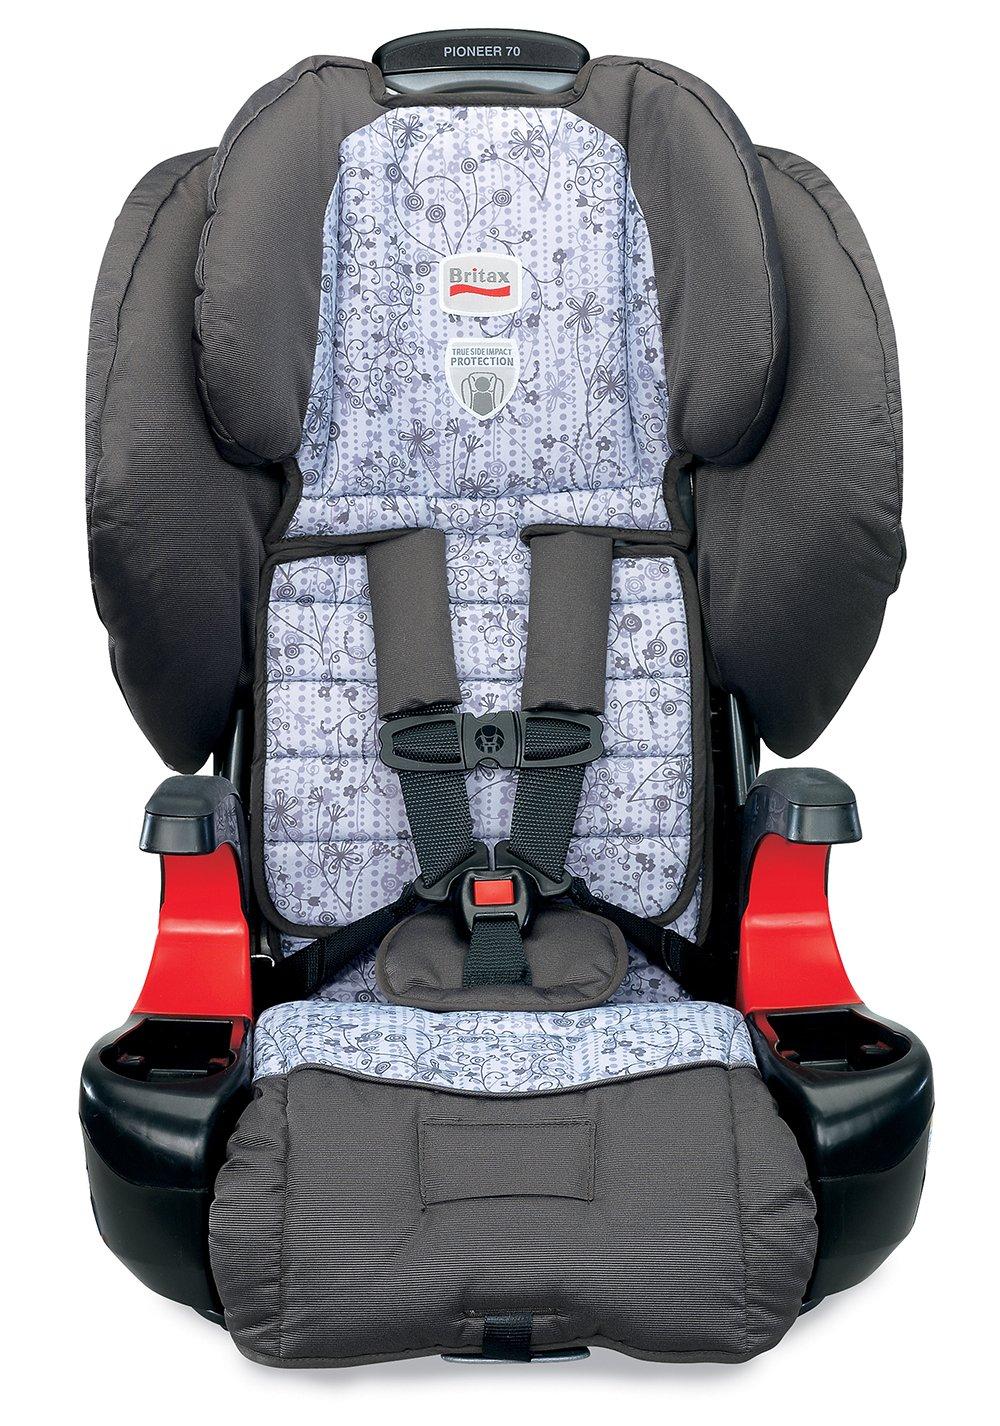 Amazon Britax Pioneer 70 Harness 2 Booster Car Seat Gardengate Prior Model Baby